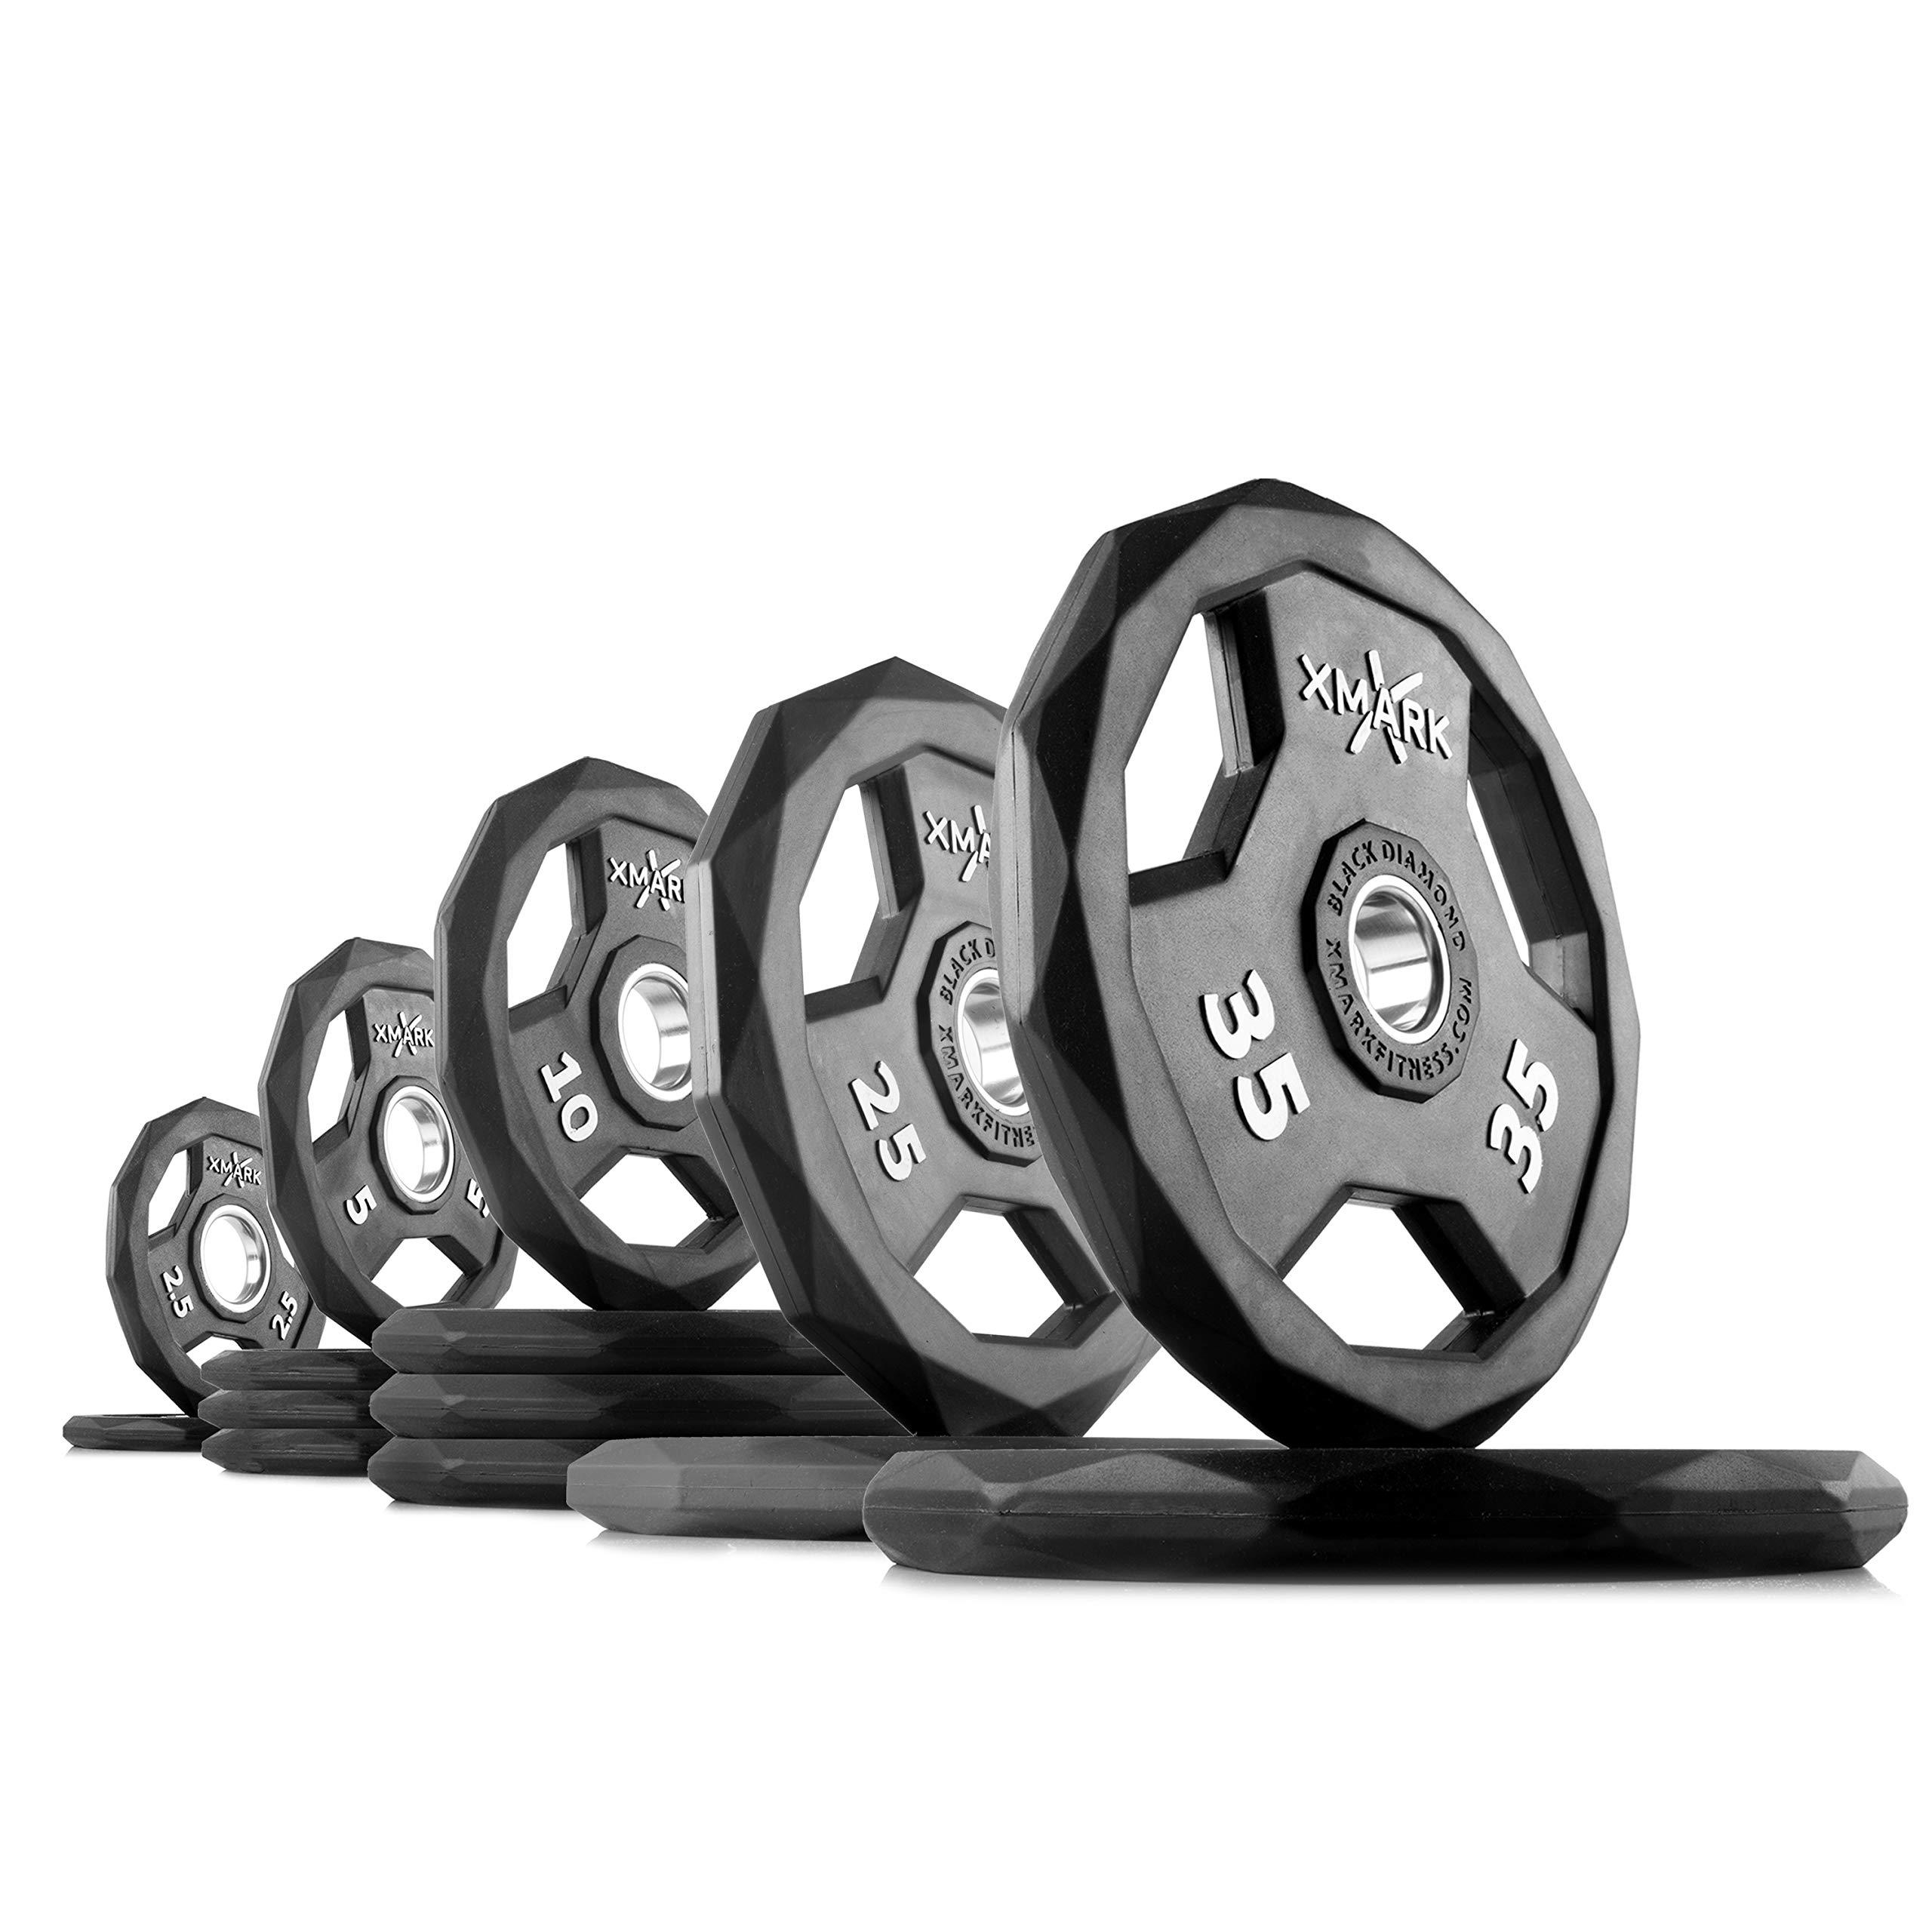 XMark Black Diamond 185 lb Set (Option 2) Olympic Weight Plates, One-Year Warranty, Patented Design